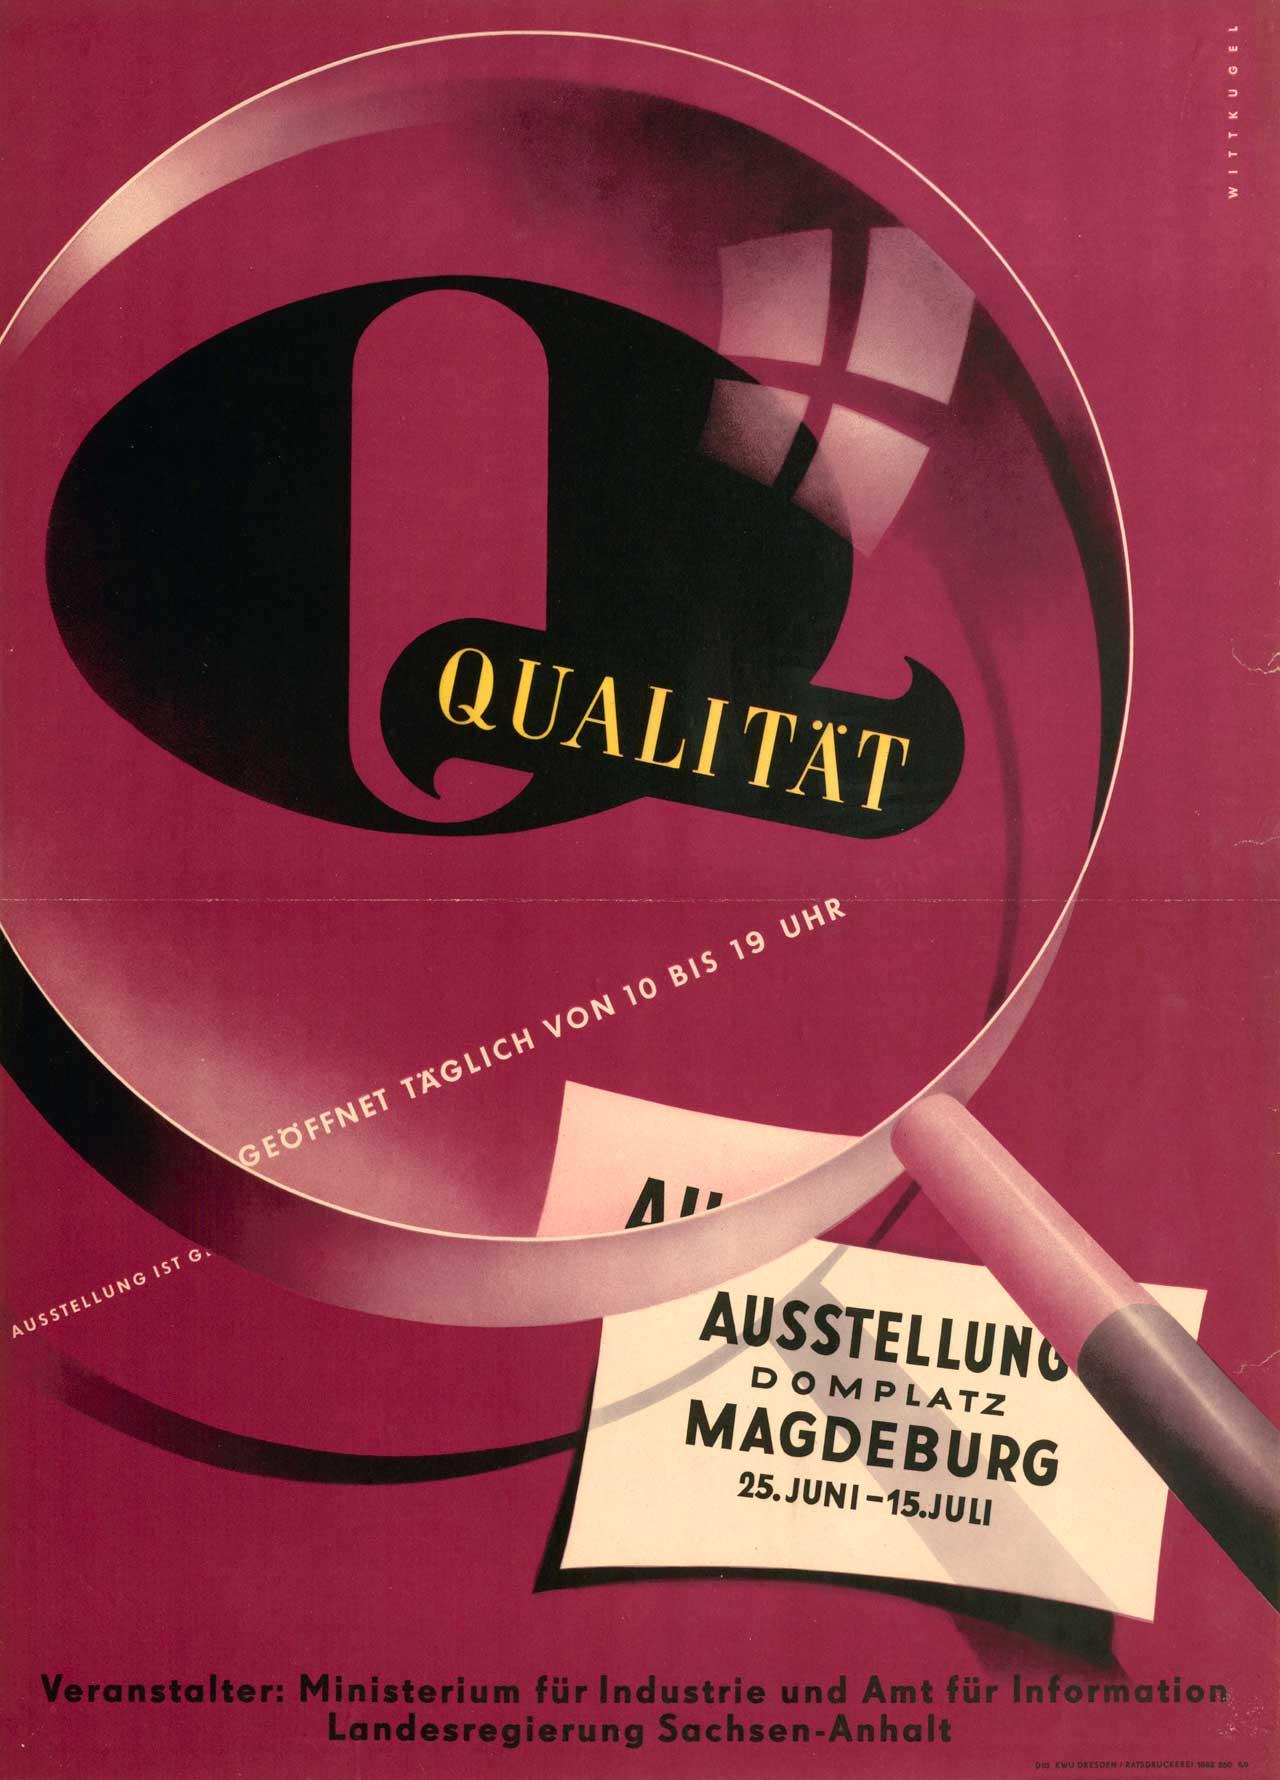 aiga-design-Wittkugel-1950-Qualitaet-02.jpg